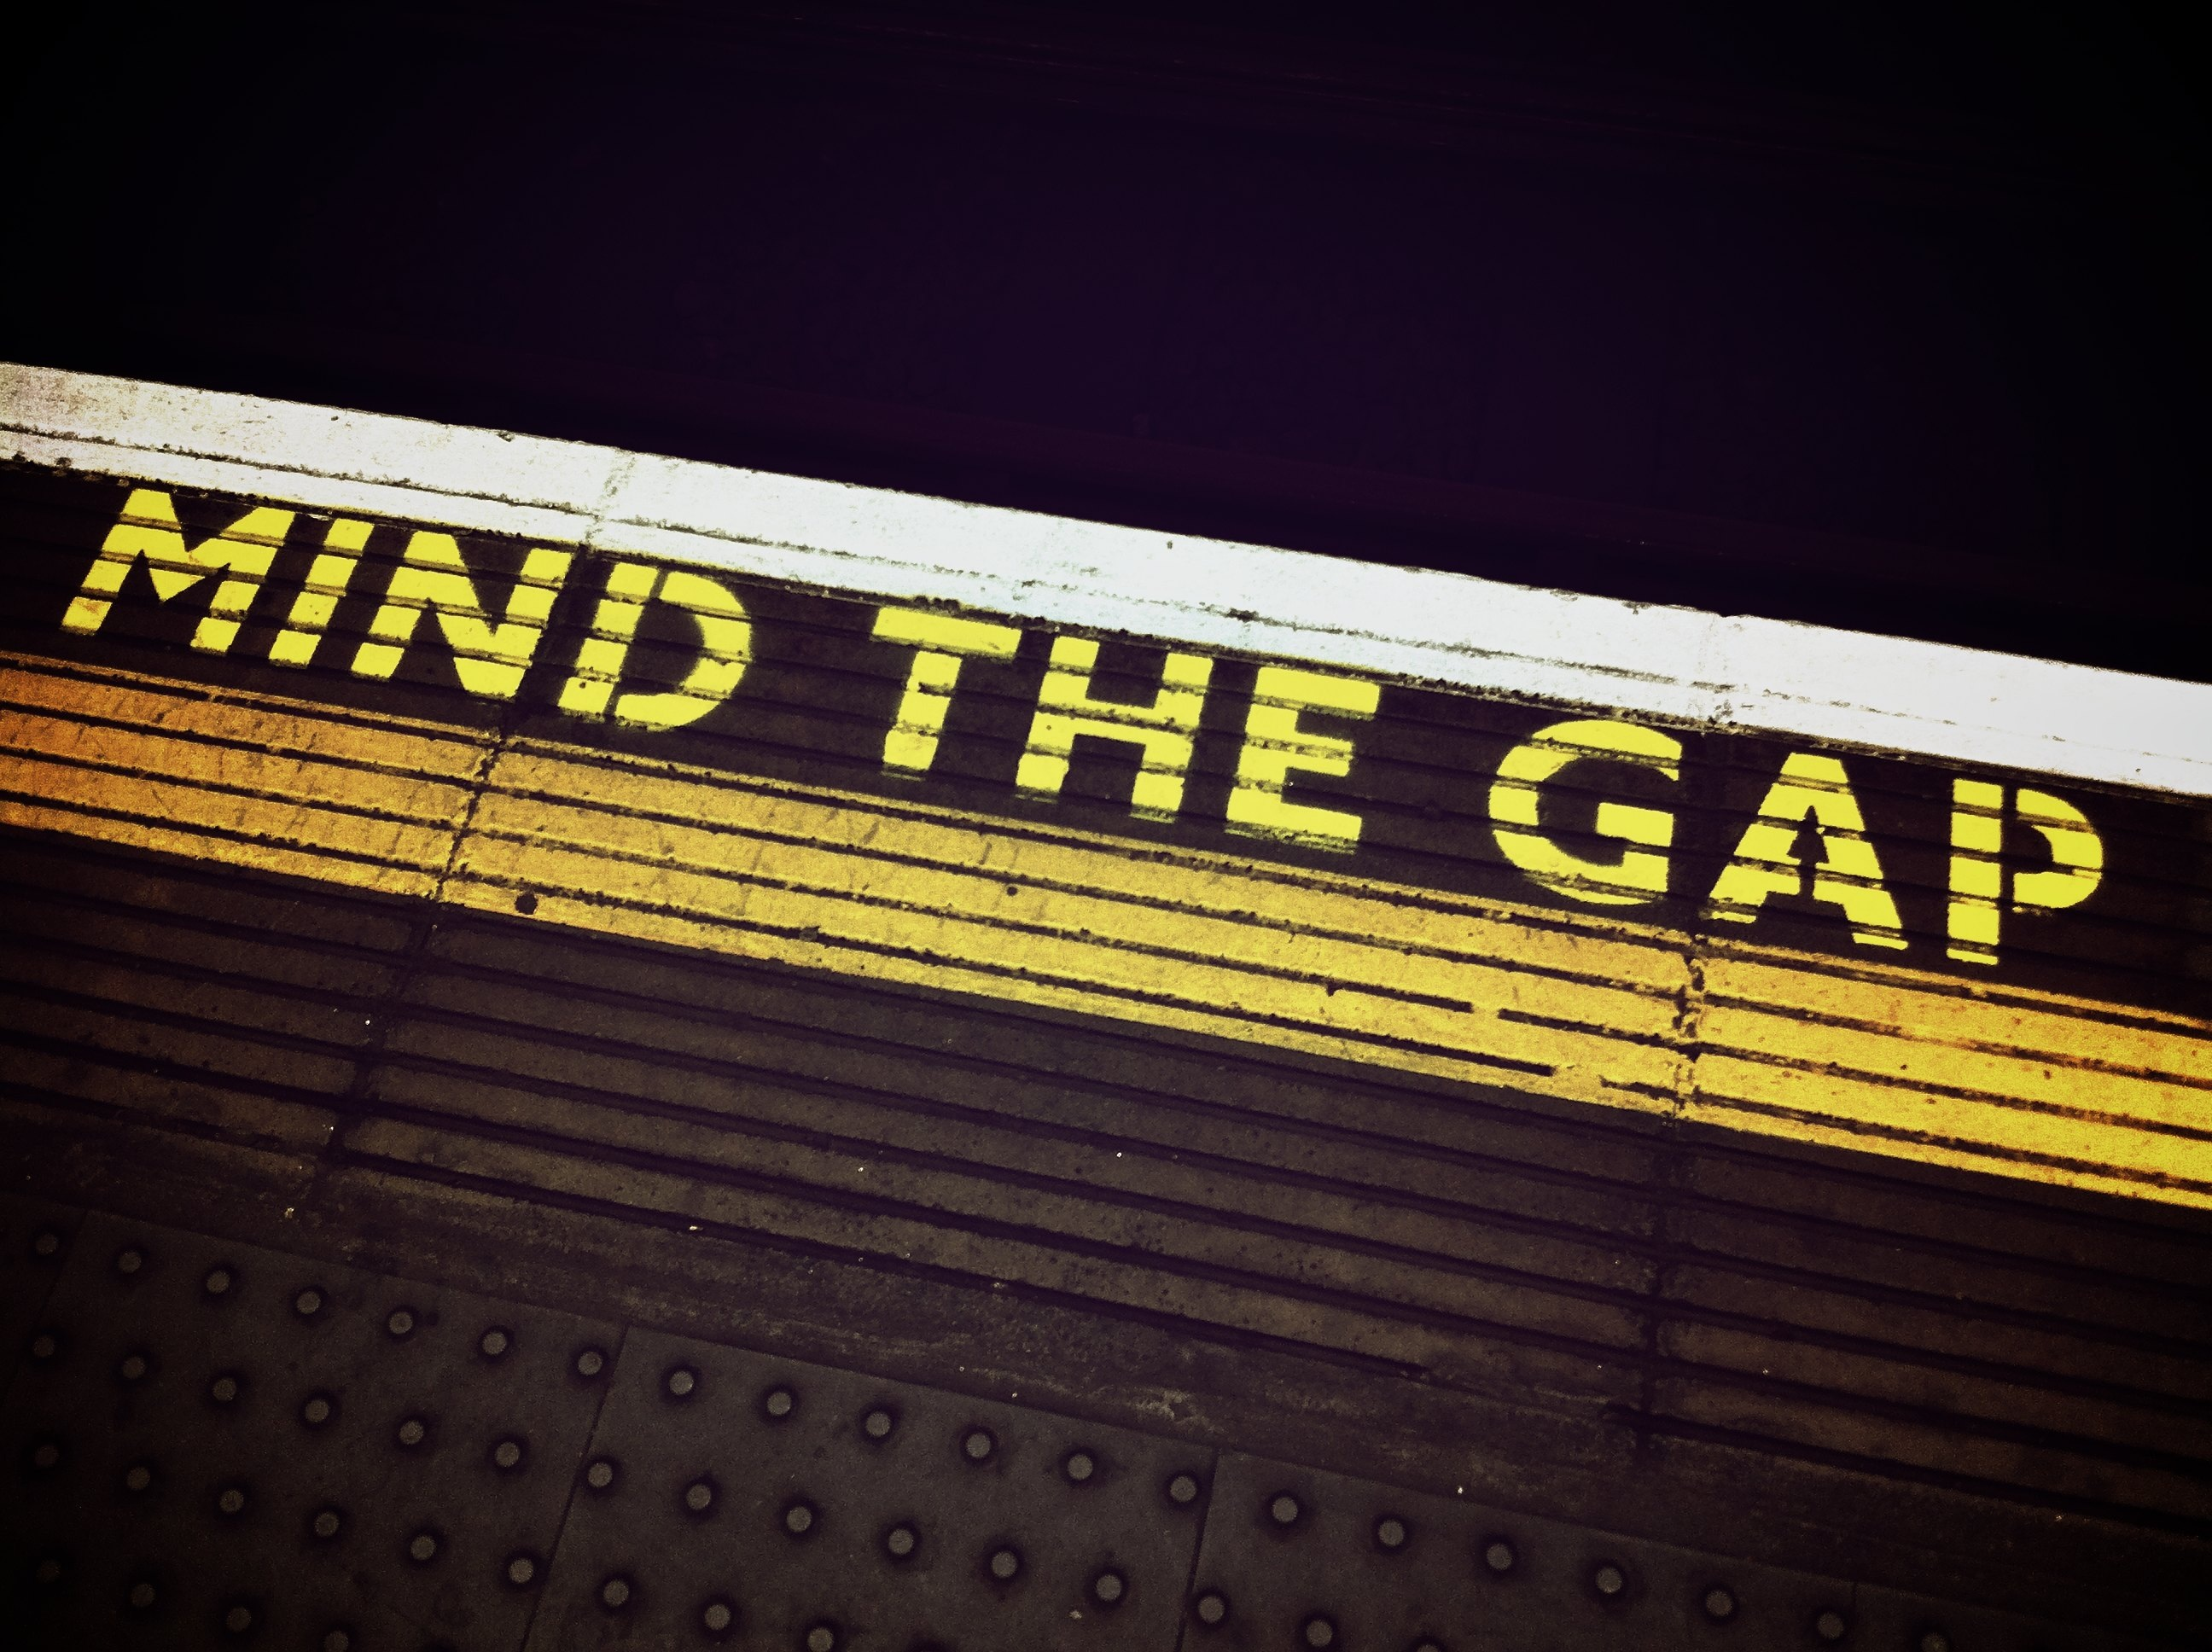 mind-the-gap-1876790.jpg